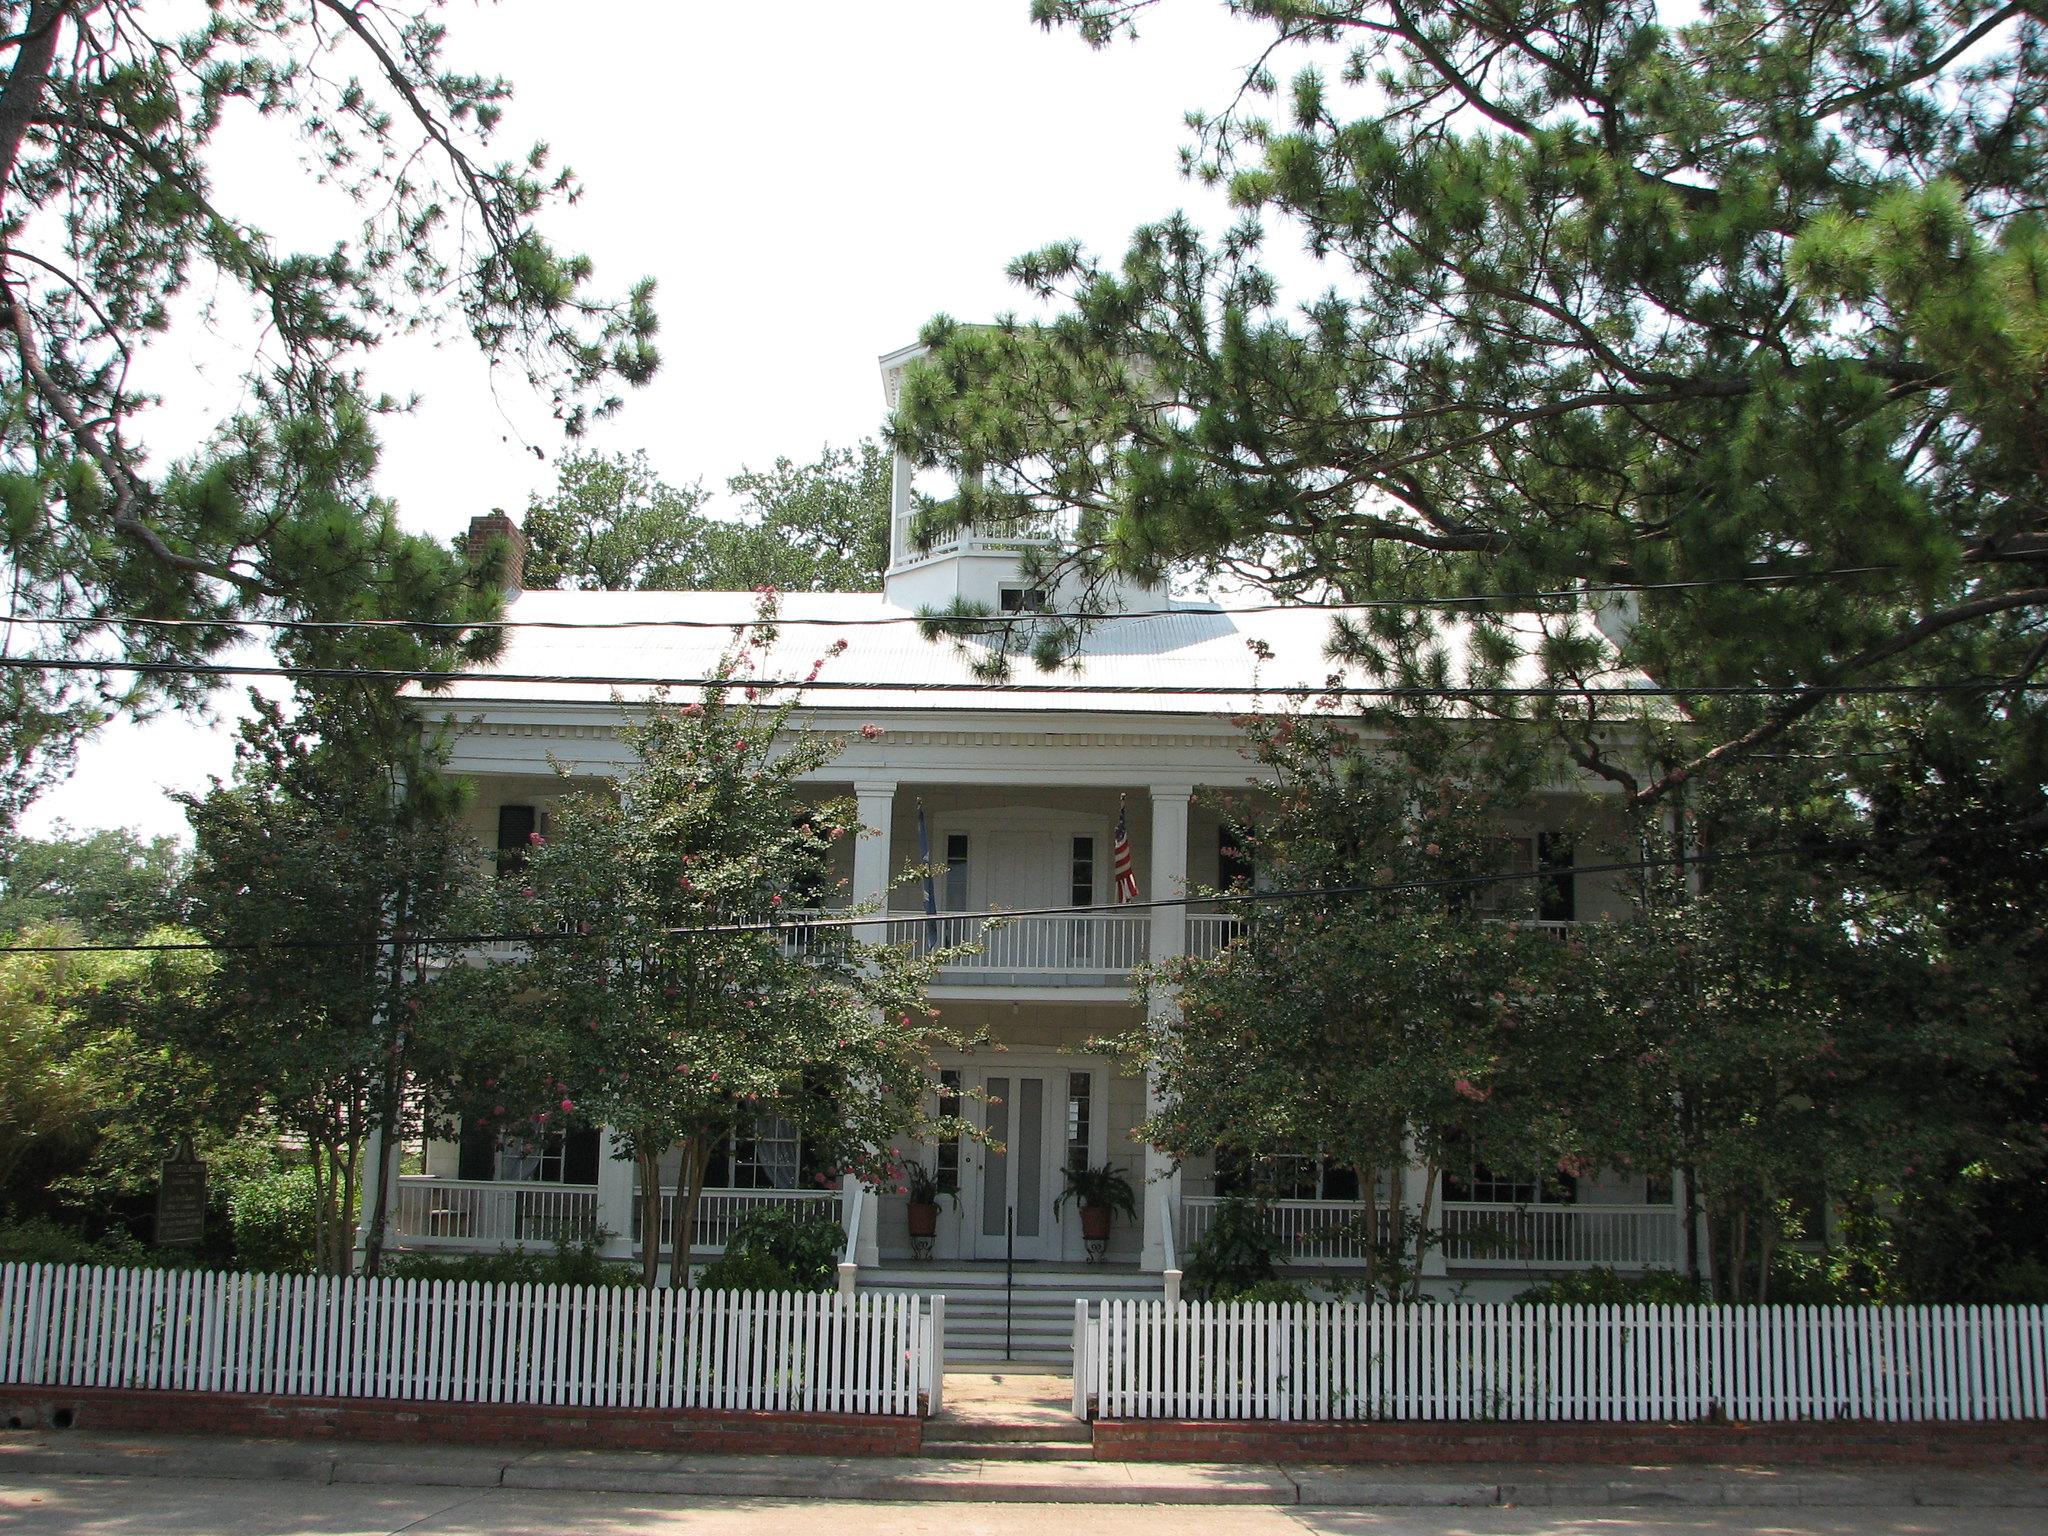 15 Things to do in Lafayette, Louisiana